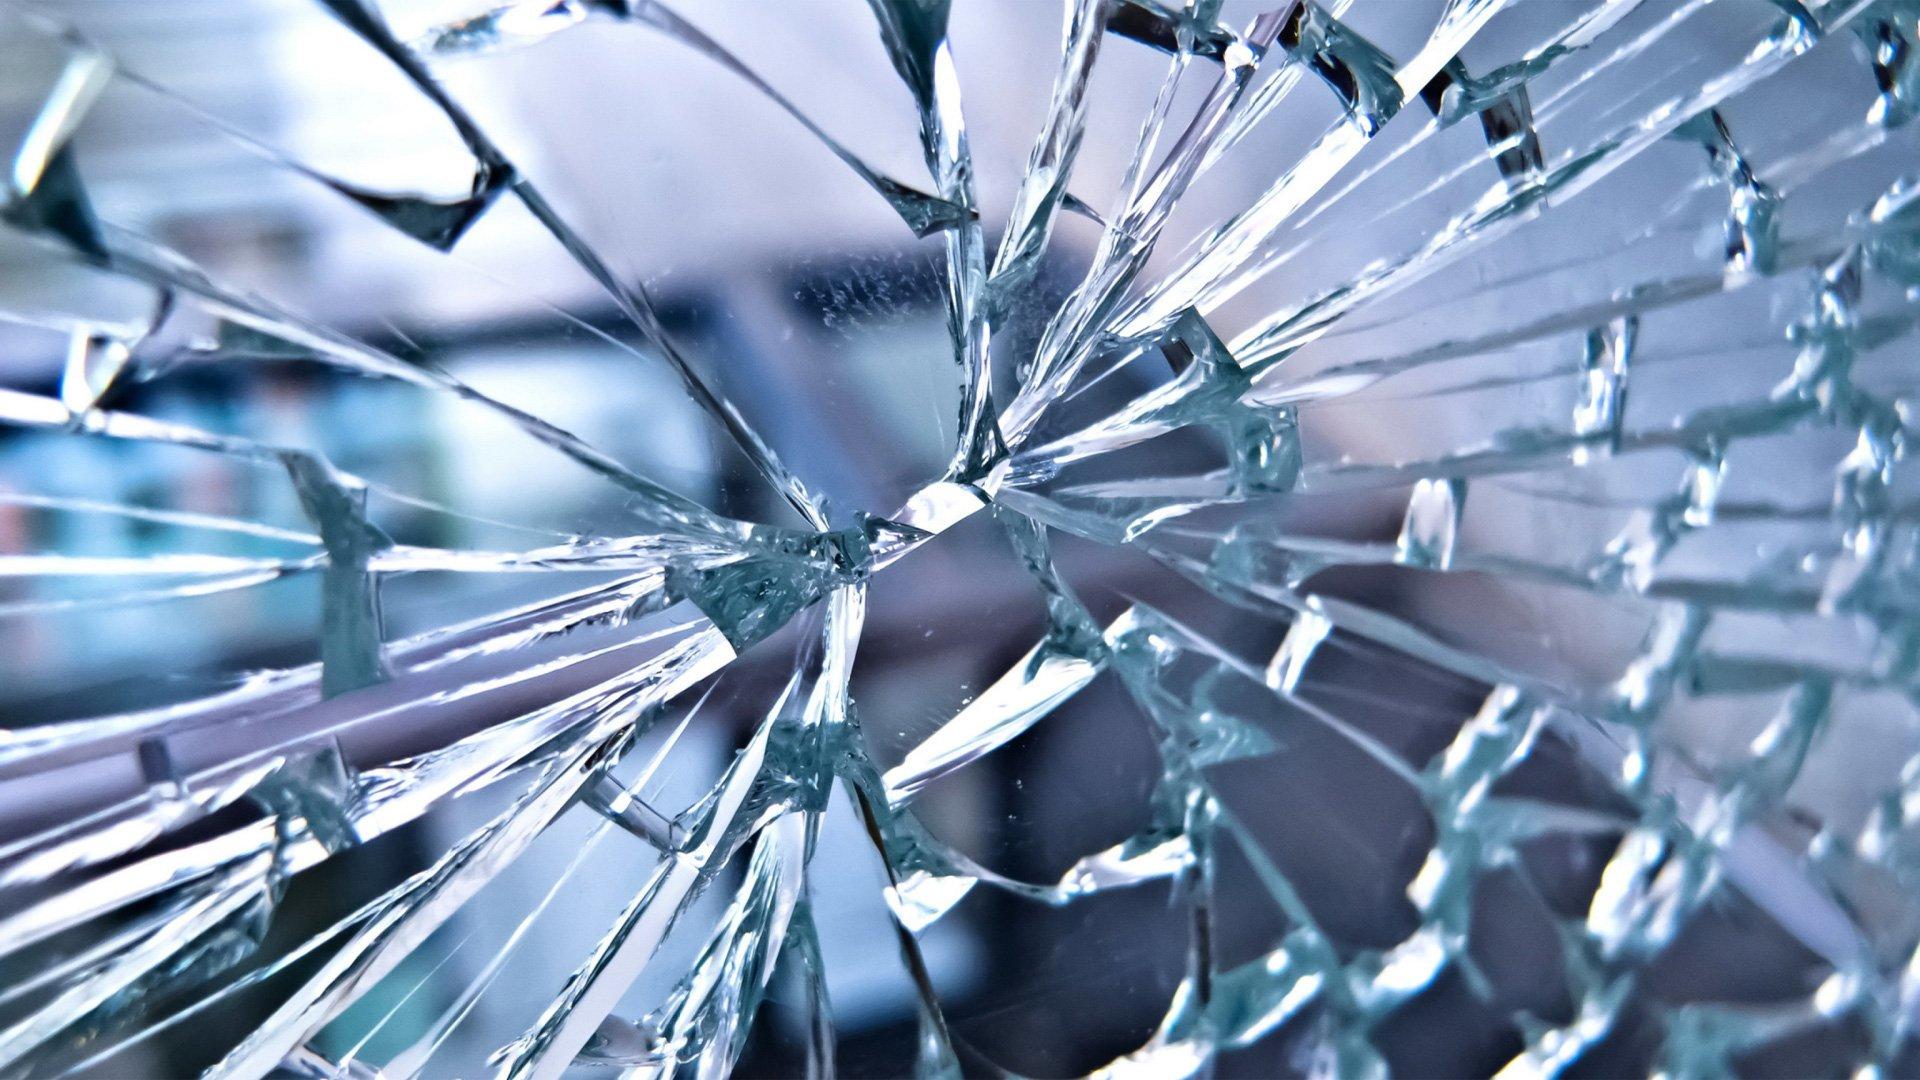 No longer walking on broken glass? - Andy Byrne